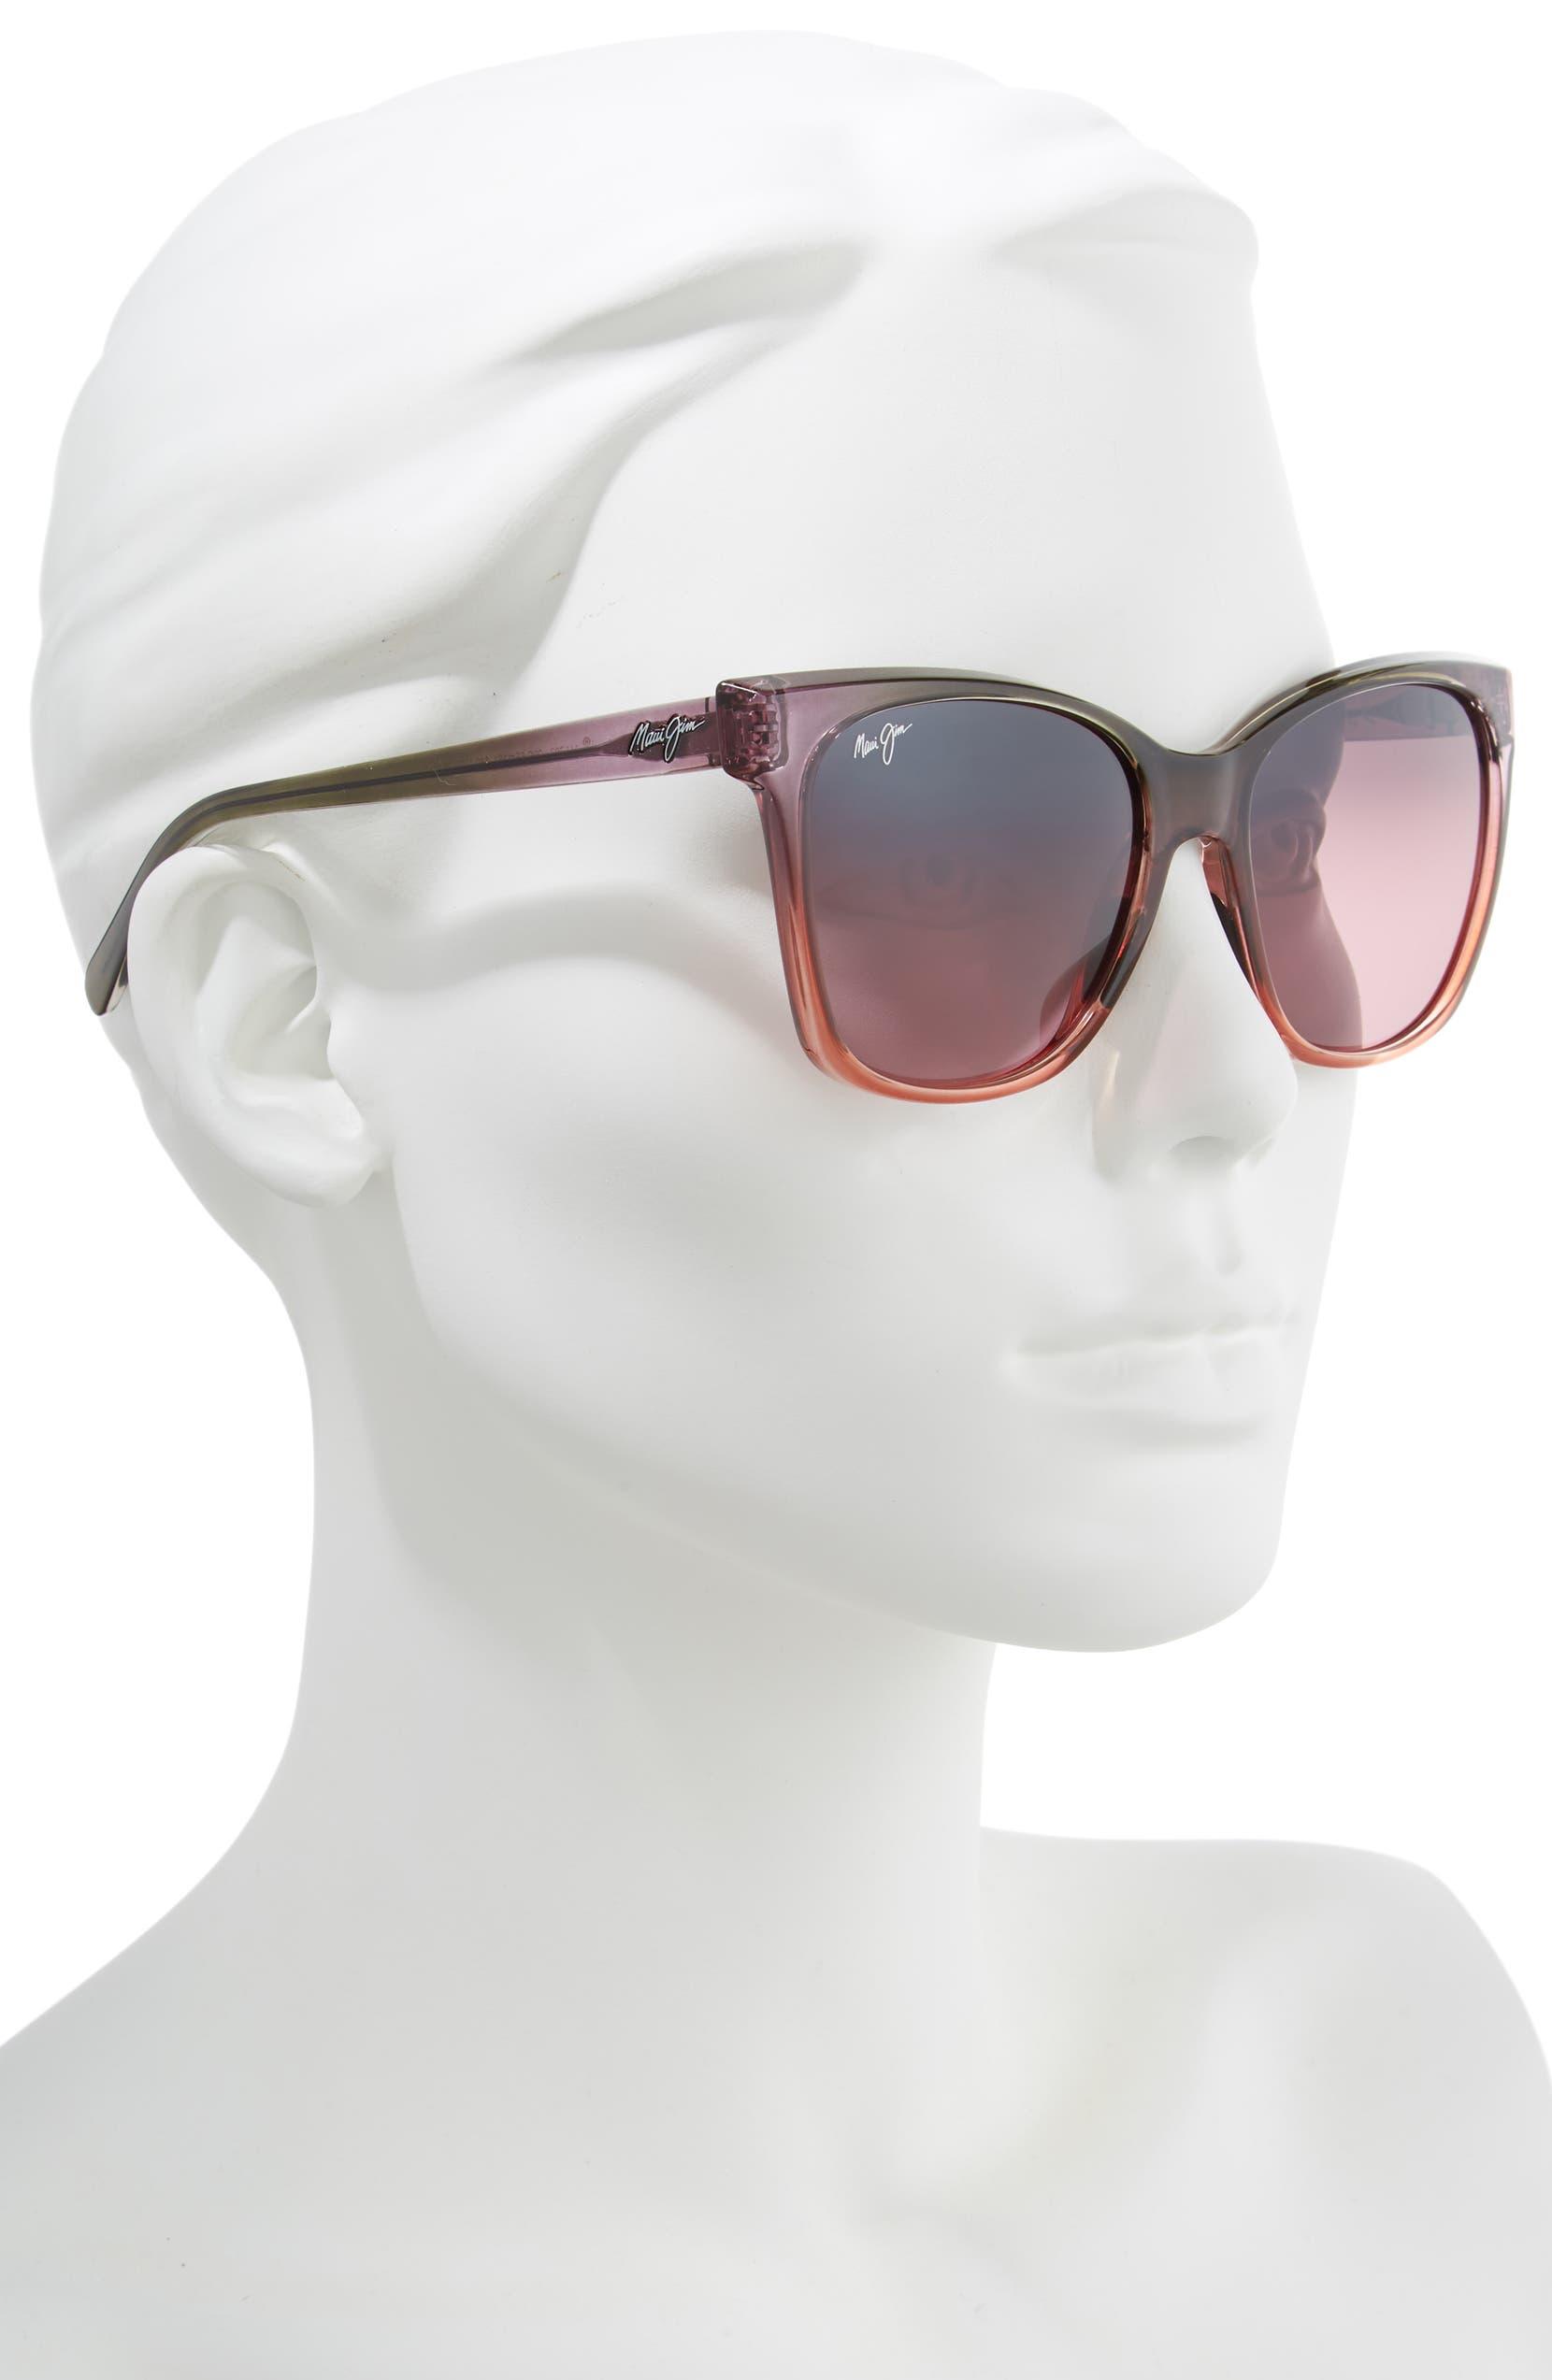 ad3f0c82fc Maui Jim Alekona 55mm Sunglasses   Nordstrom